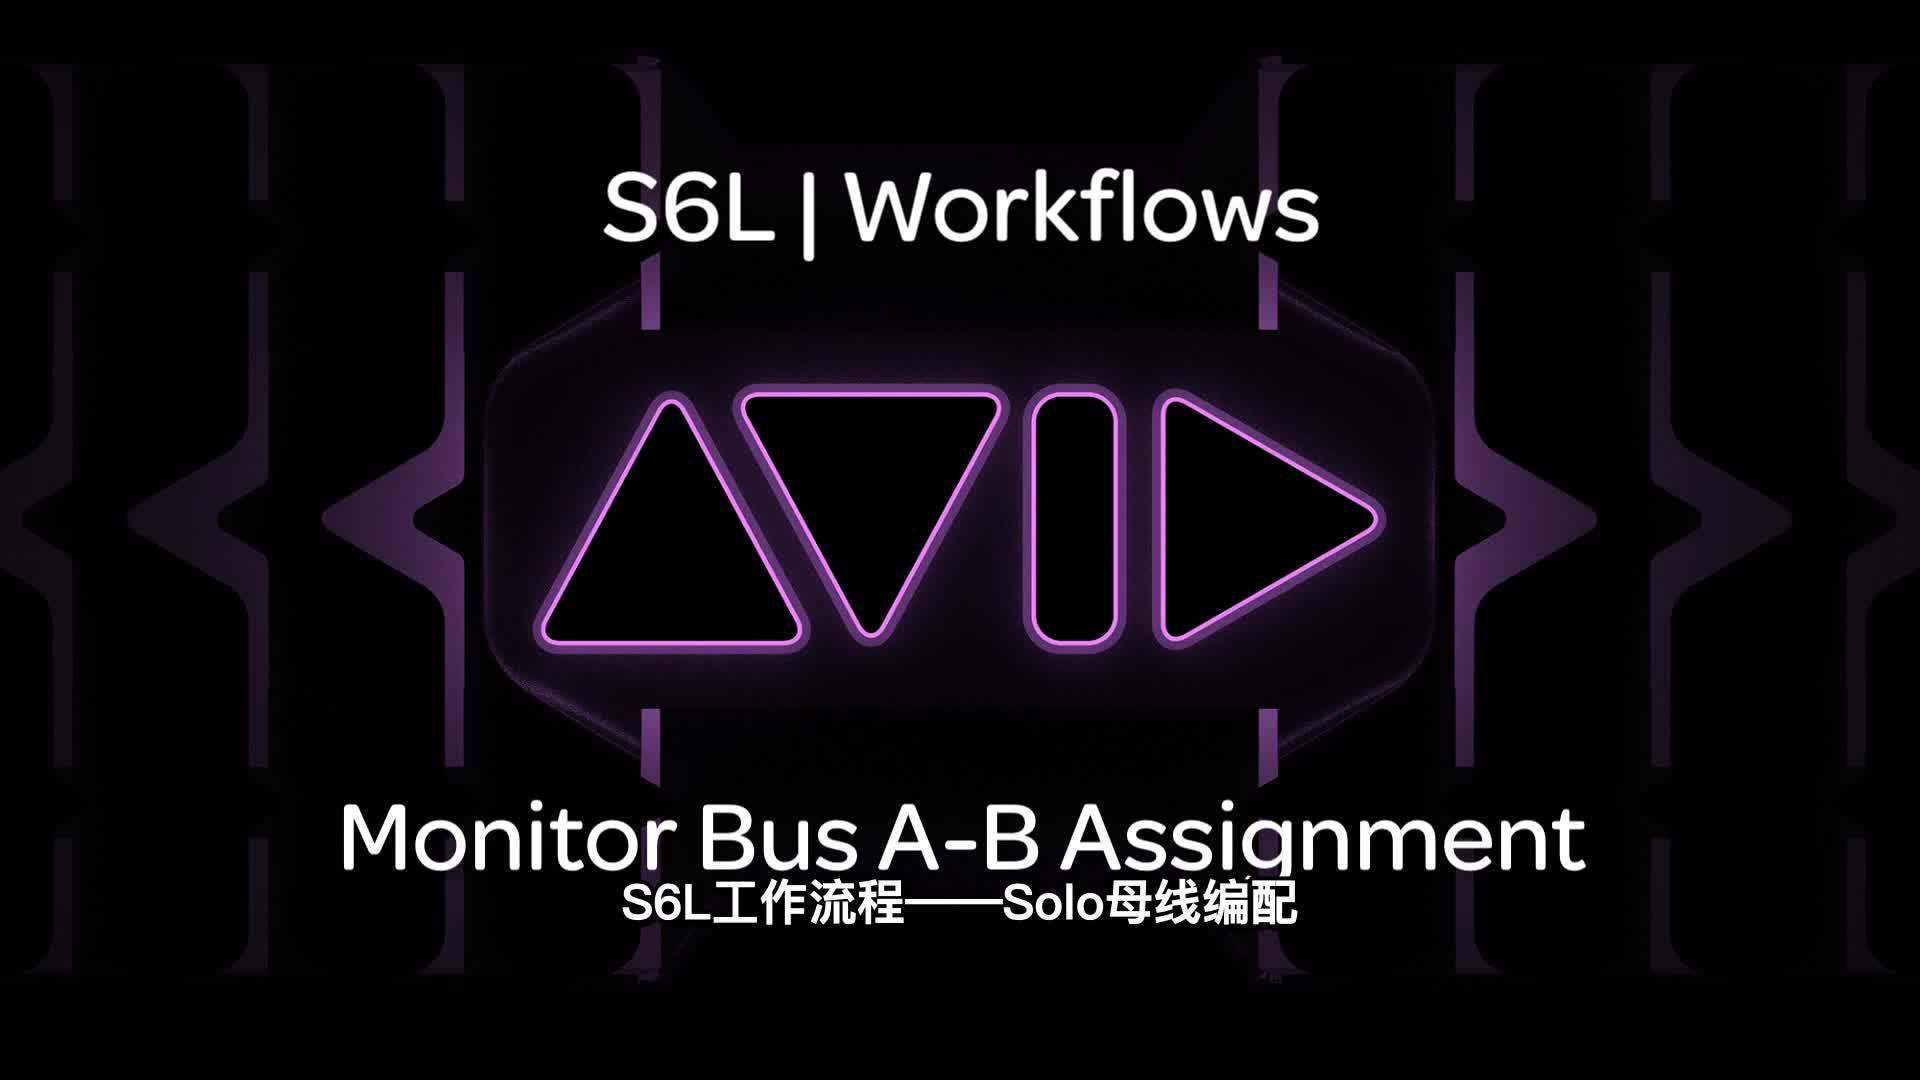 VENUE  S6L 操作流程系列视频9_Solo总线编配